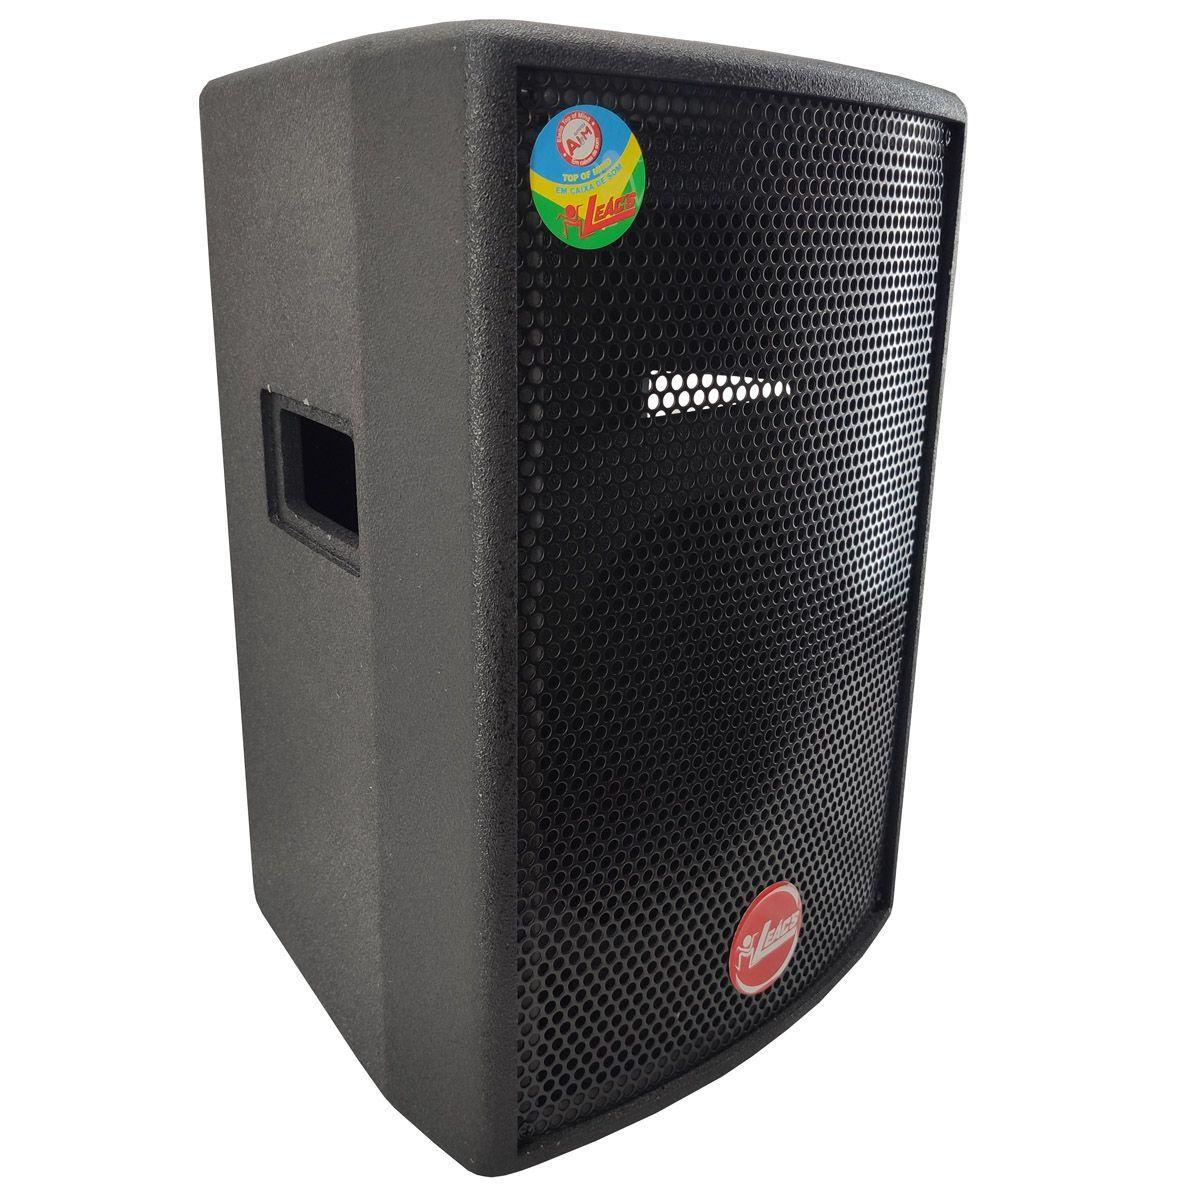 Gabinete Caixa Acústica TP 10 - Leacs (Gabinete Vazio)  - RS Som e Luz!